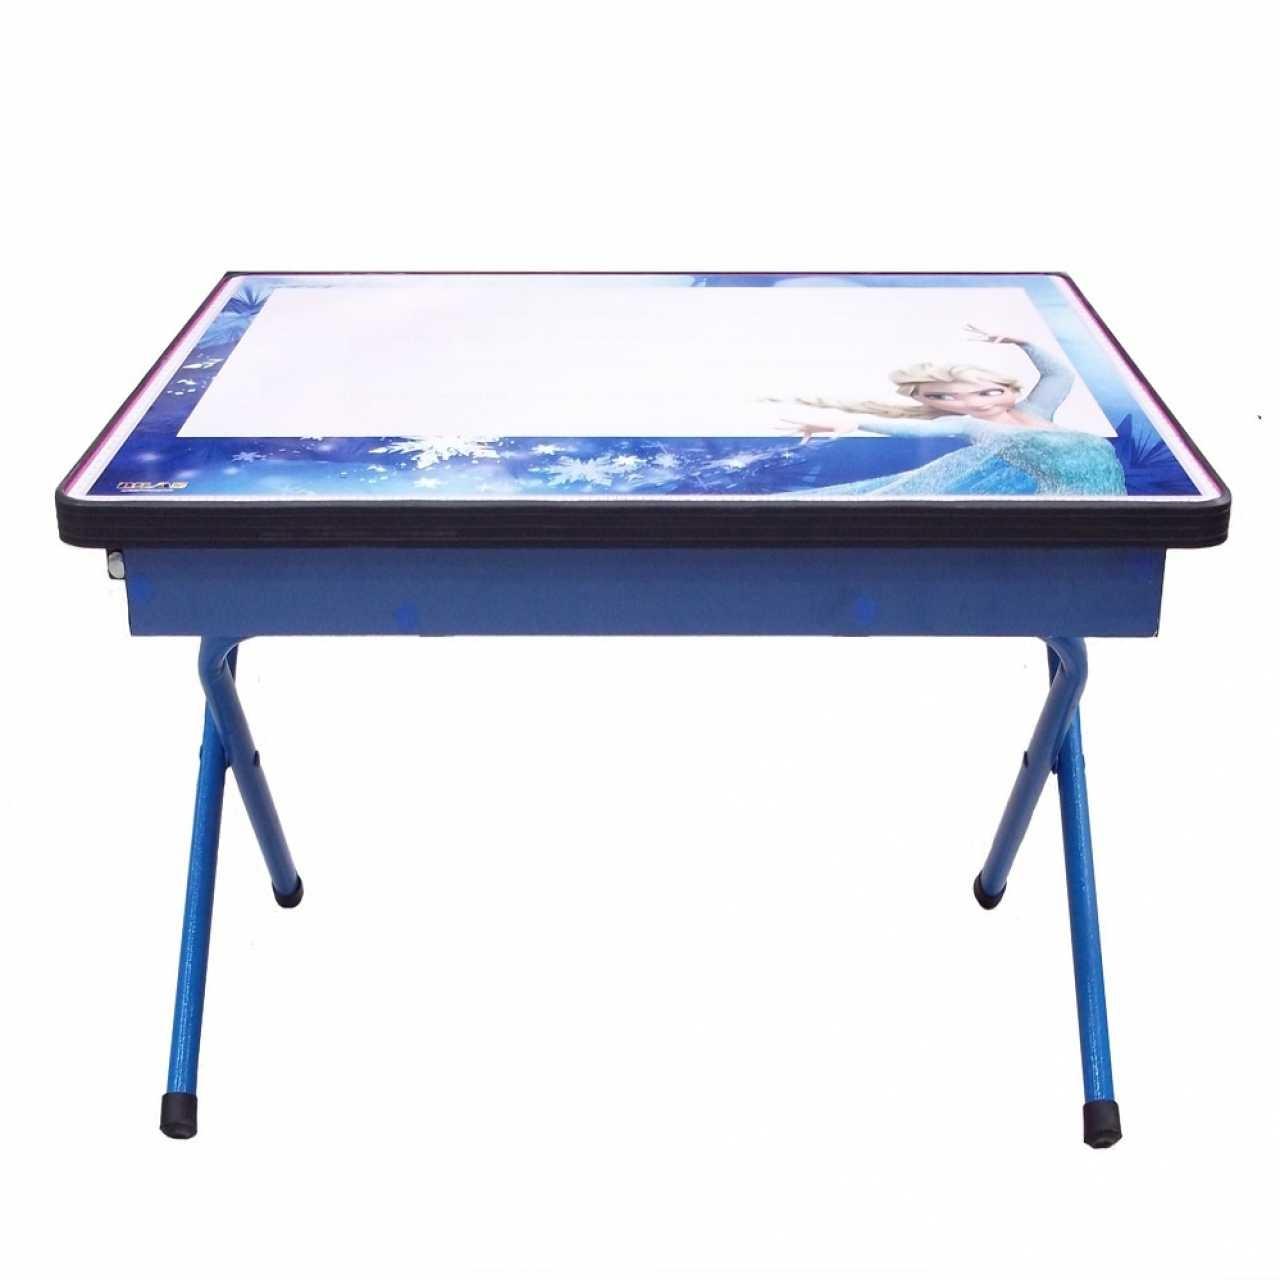 میز تحریر بیلن مدل P4- طرح Frozen